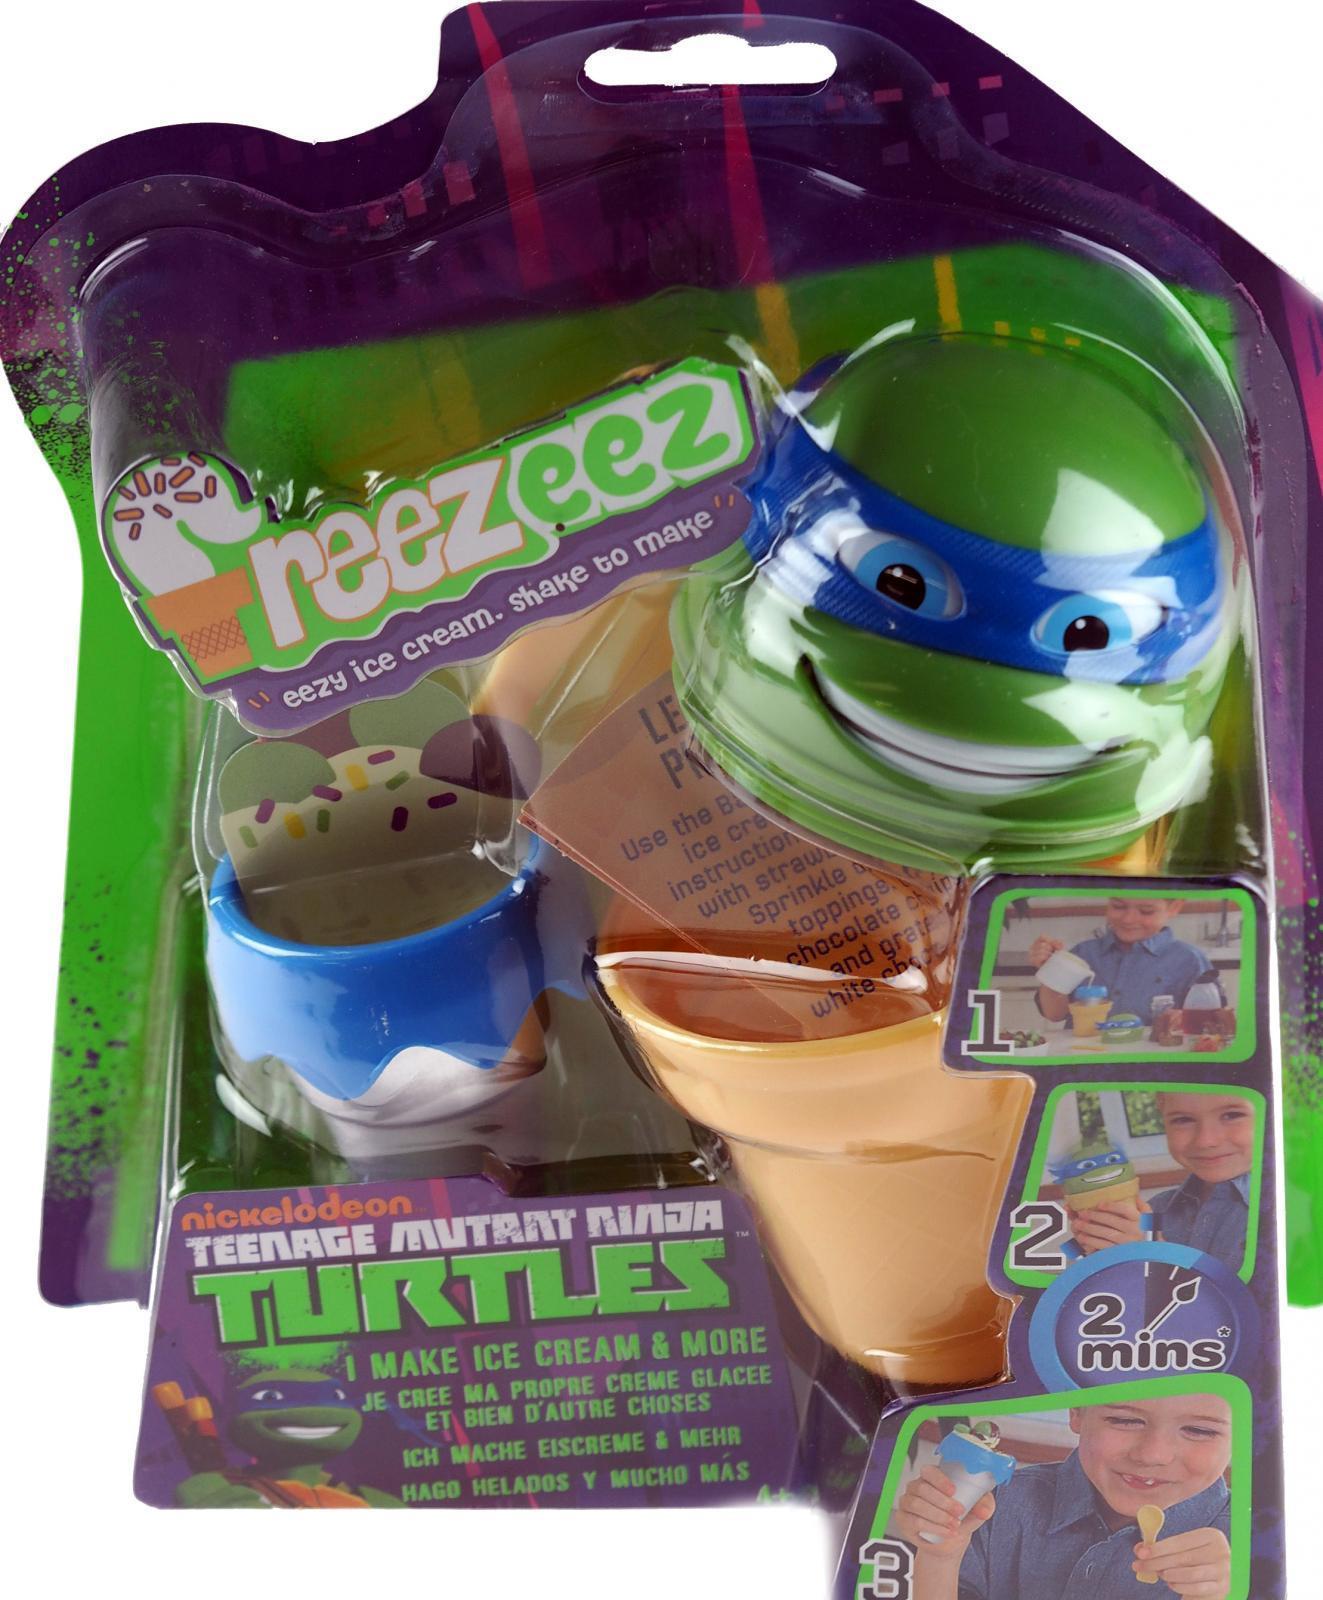 Freezeez kids make your own teenage mutant ninja turtles ice cream image of freezeez kids make your own teenage mutant ninja turtles ice cream maker ccuart Images